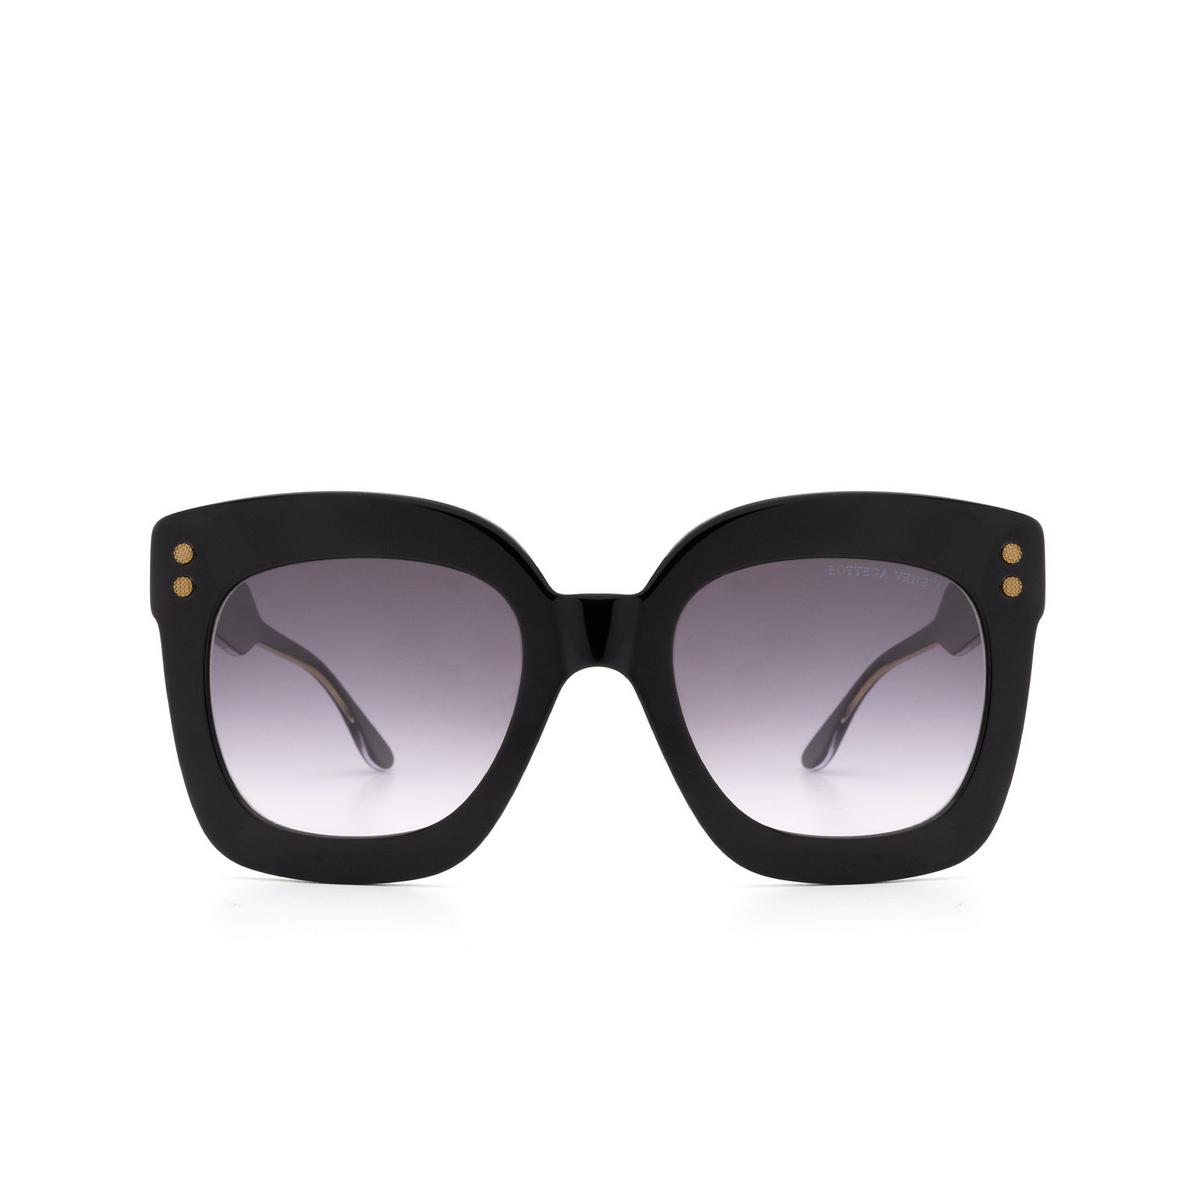 Bottega Veneta® Square Sunglasses: BV0238S color Black 001 - front view.